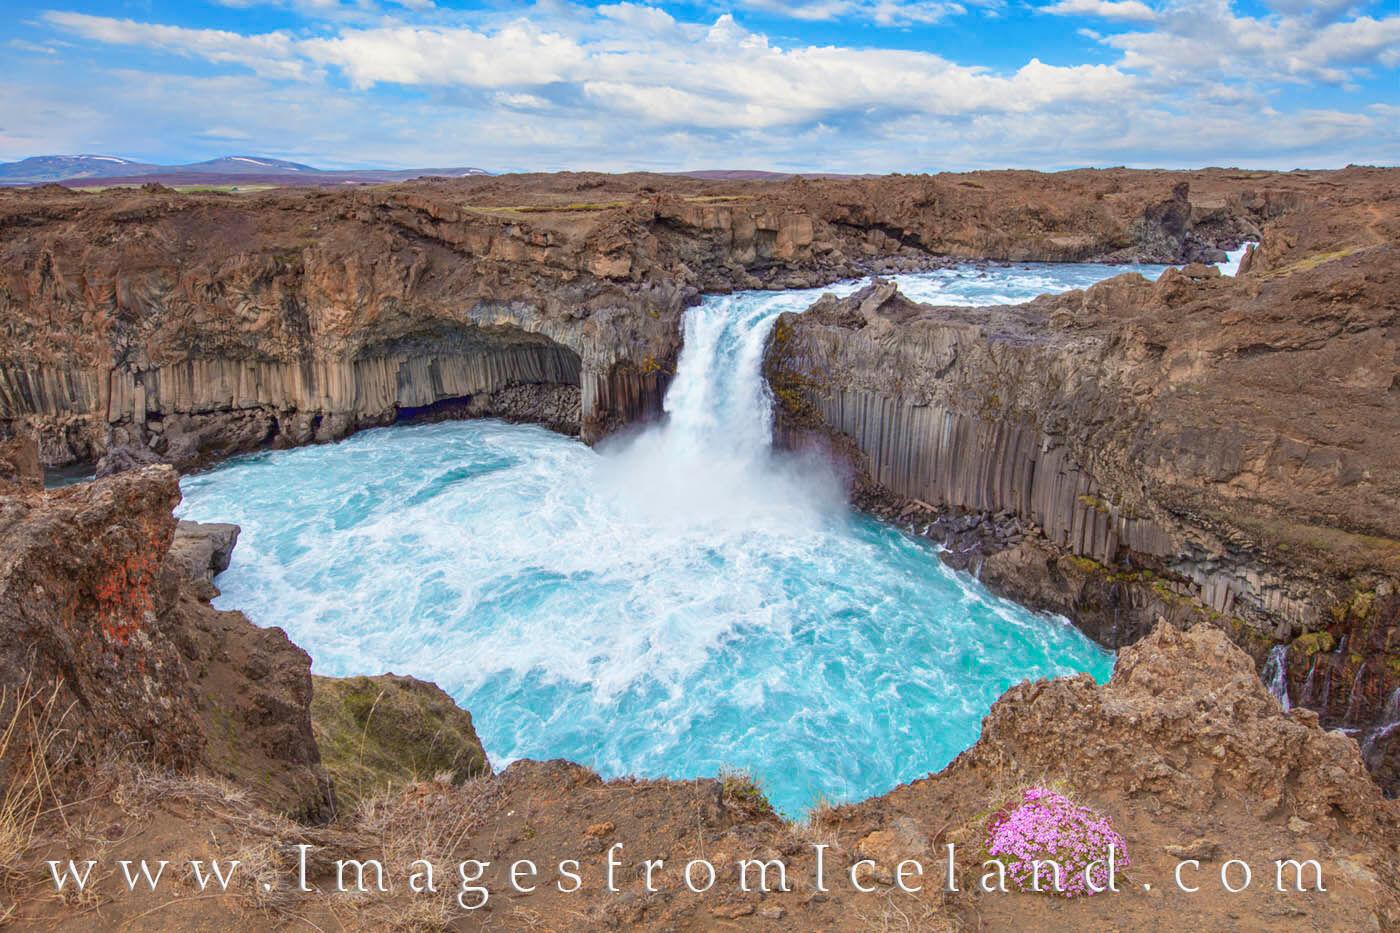 At the Aldeyjarfoss waterfall in the northern Iceland highlands, the Skjálfandafljót River drops ~ 65 feet. Flanked by basalt...